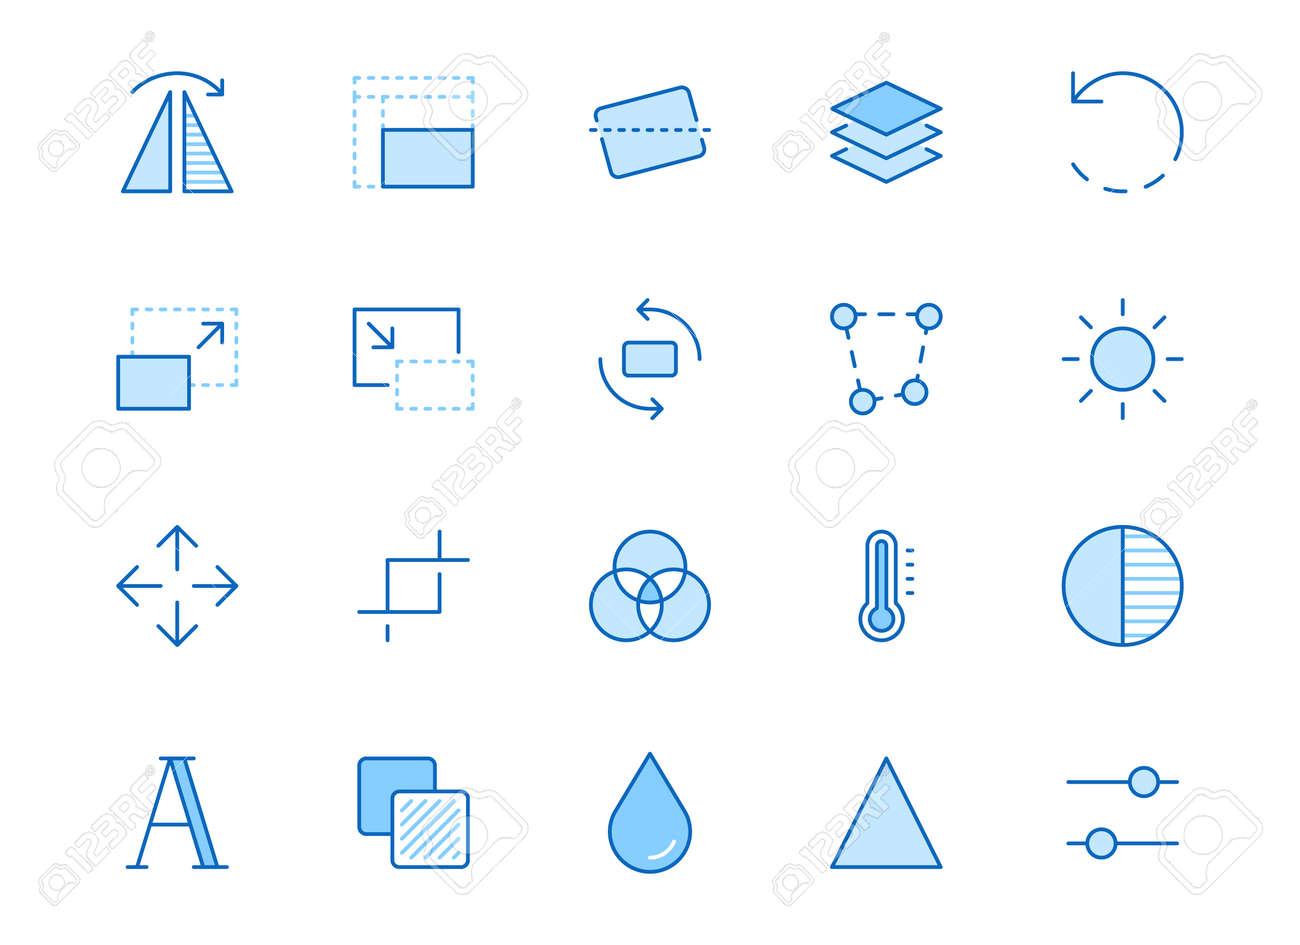 Photo edit line icon set. Flip, crop image, color filter, adjust effects, contrast minimal vector illustration. Simple outline signs for photography application. Blue color, Editable Stroke. - 163160939